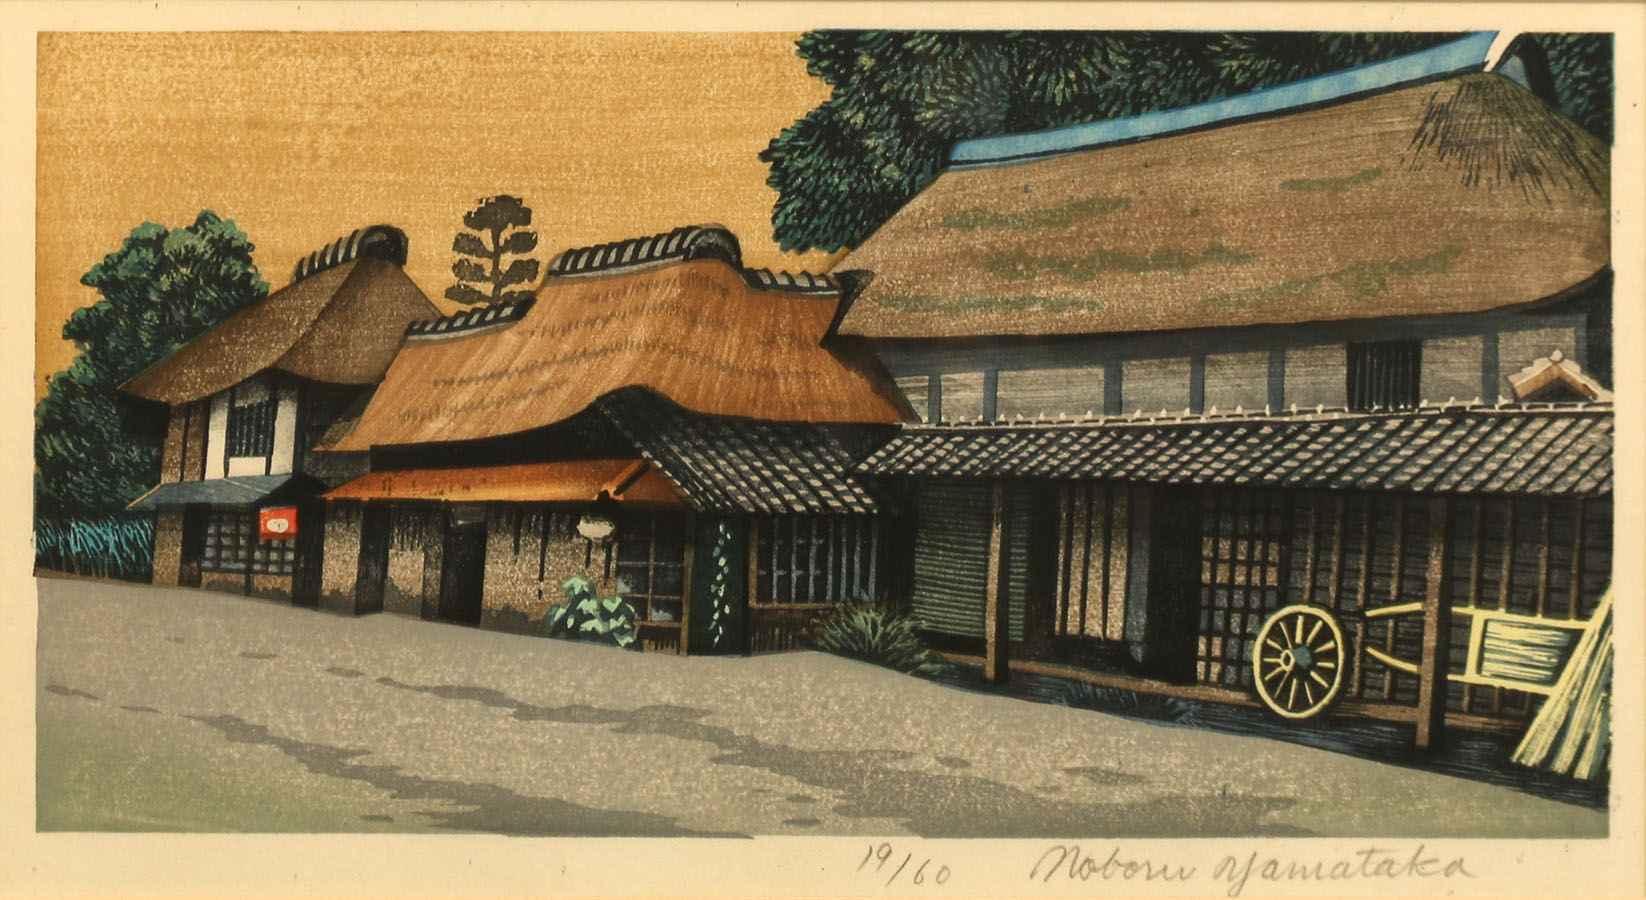 Farmhouses by  Noboru Yamataka - Masterpiece Online